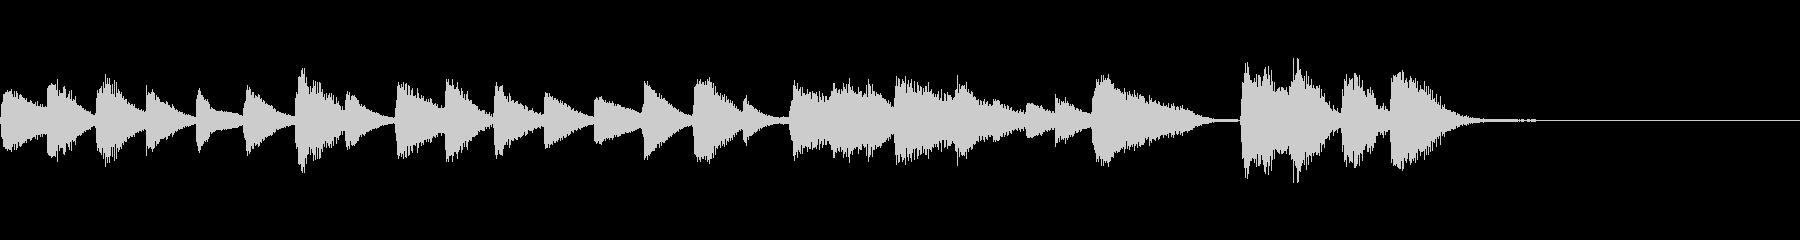 Is it a little comical? A cute piano jingle's unreproduced waveform